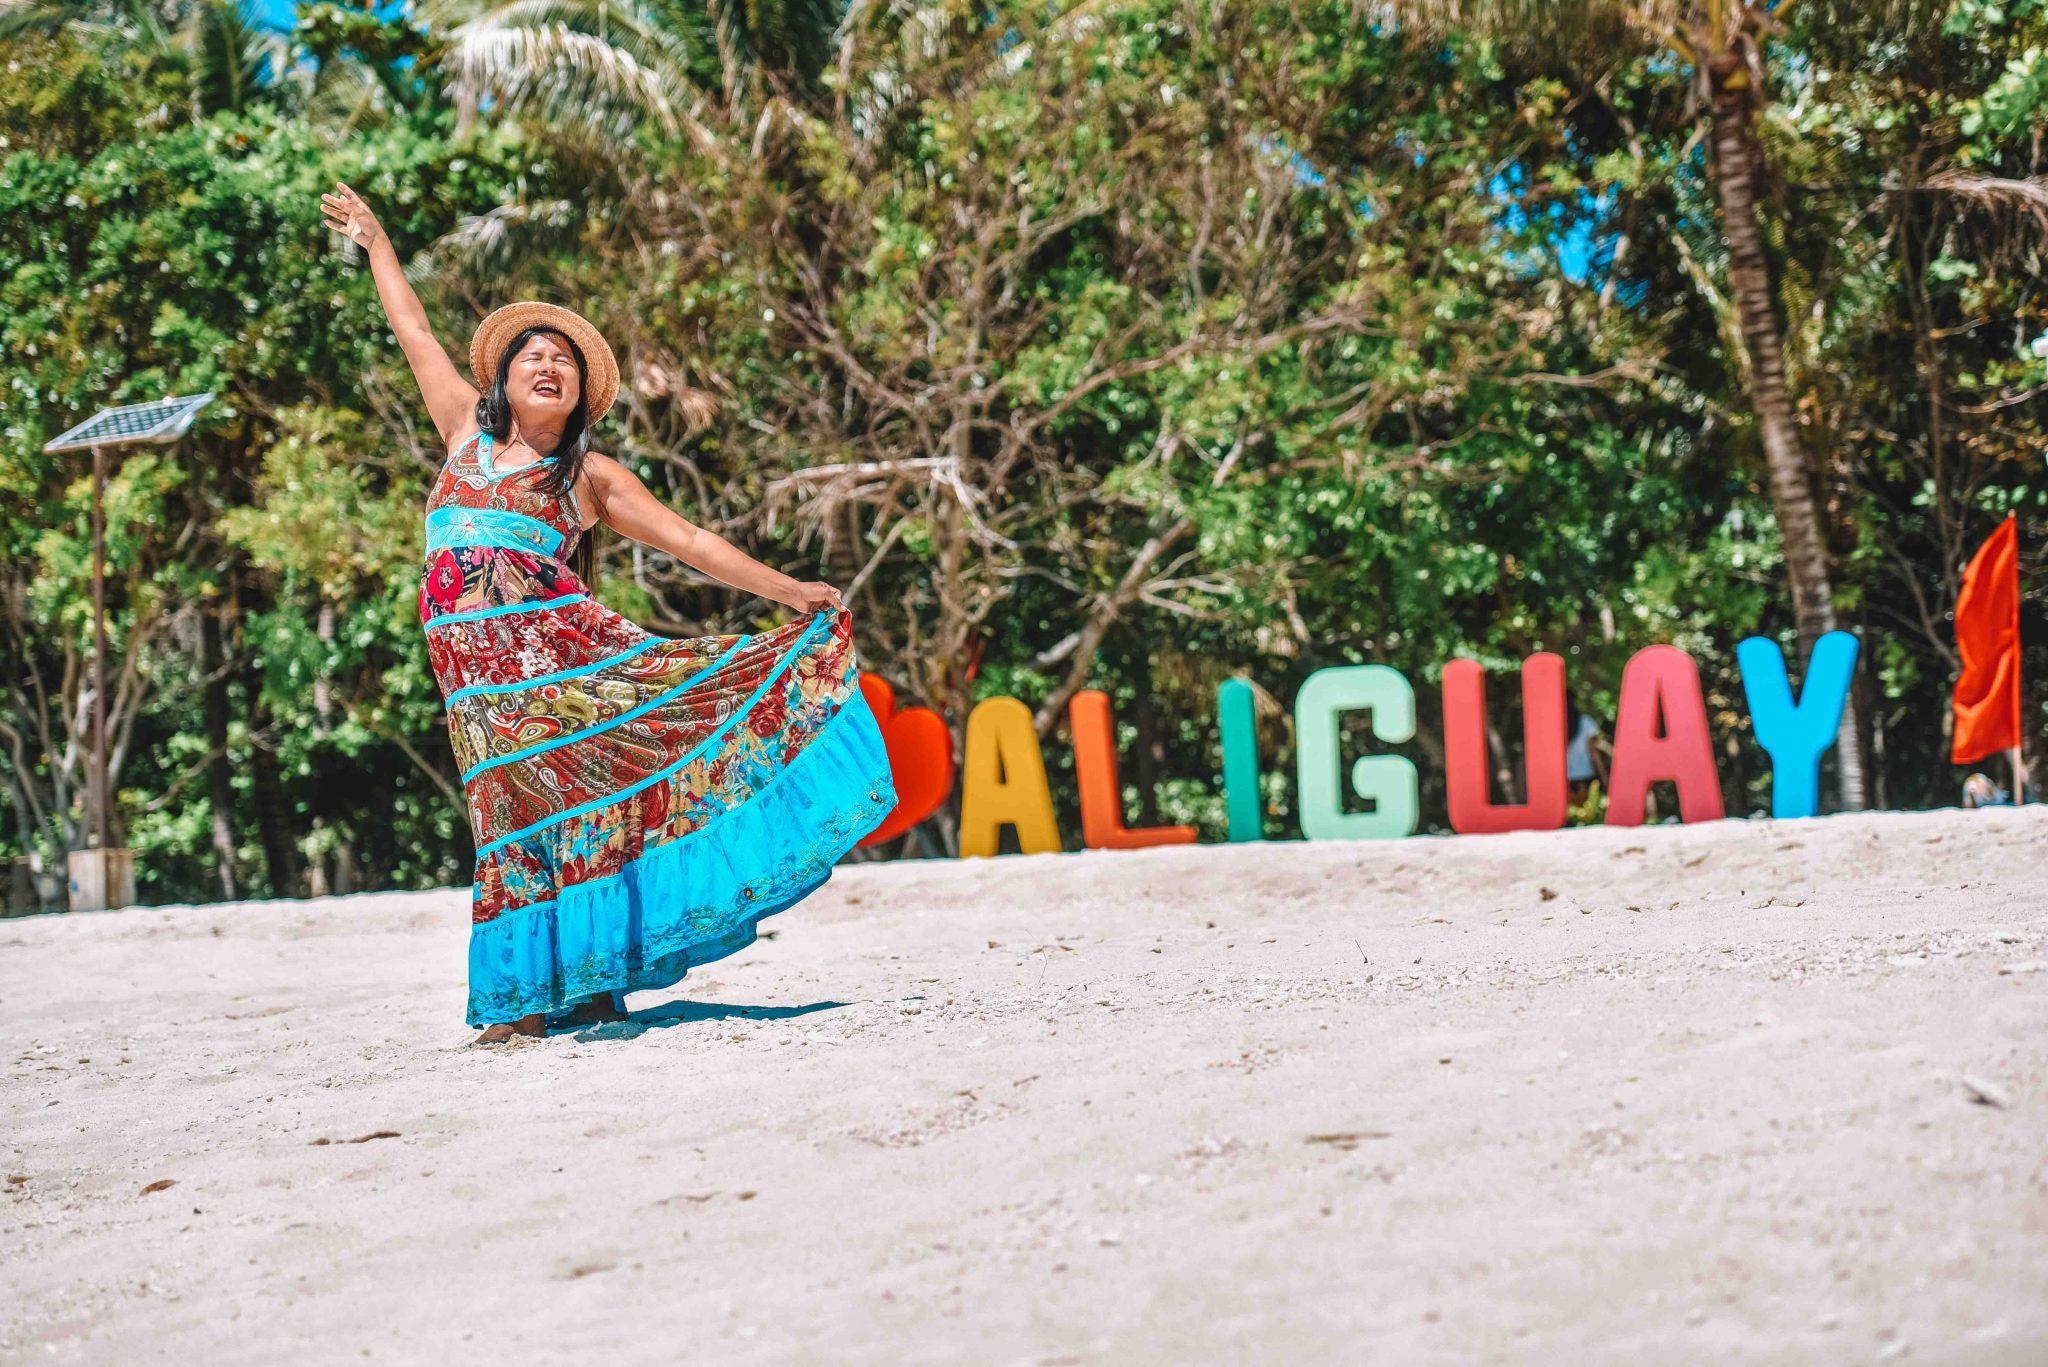 Aliguay Island